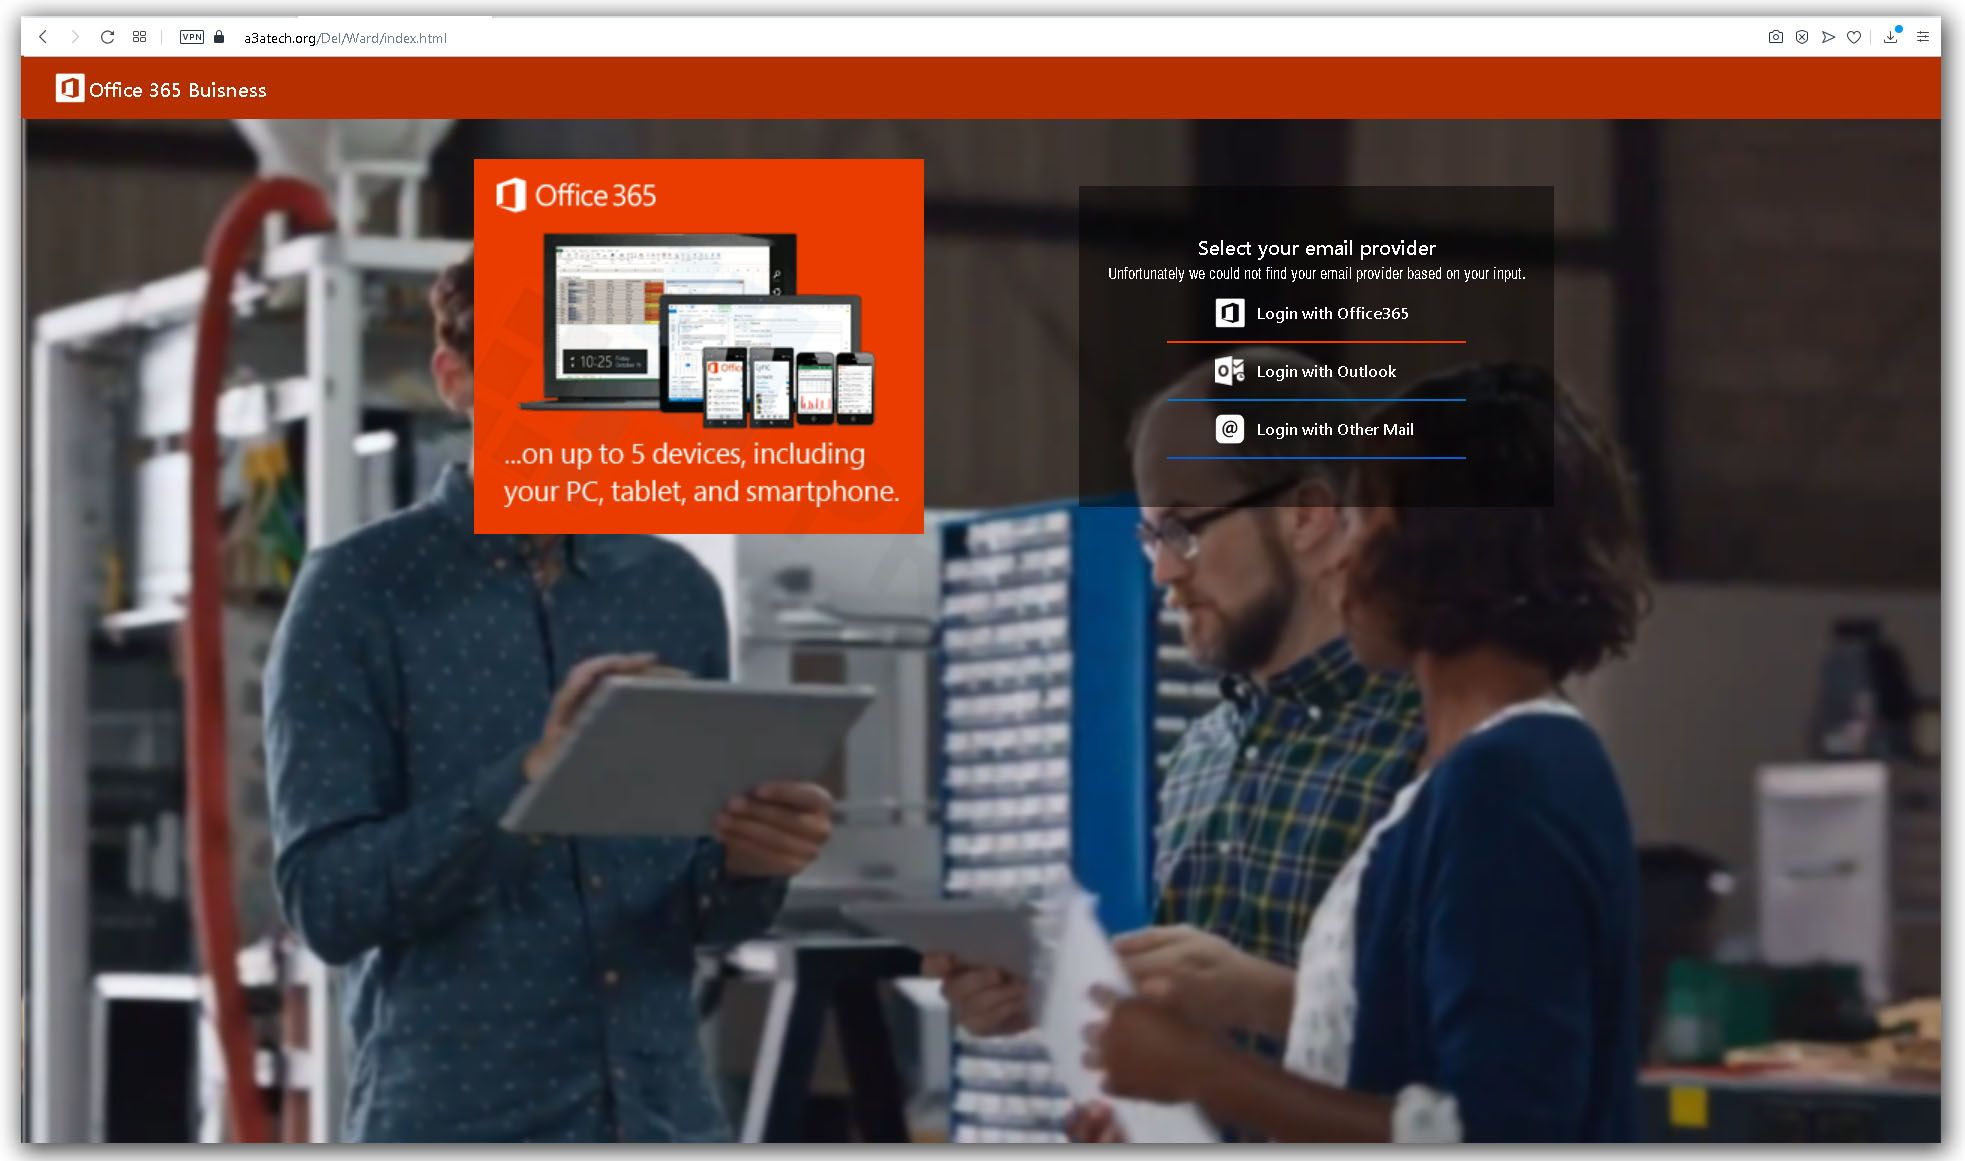 Spreparowana strona uslugi Office 365